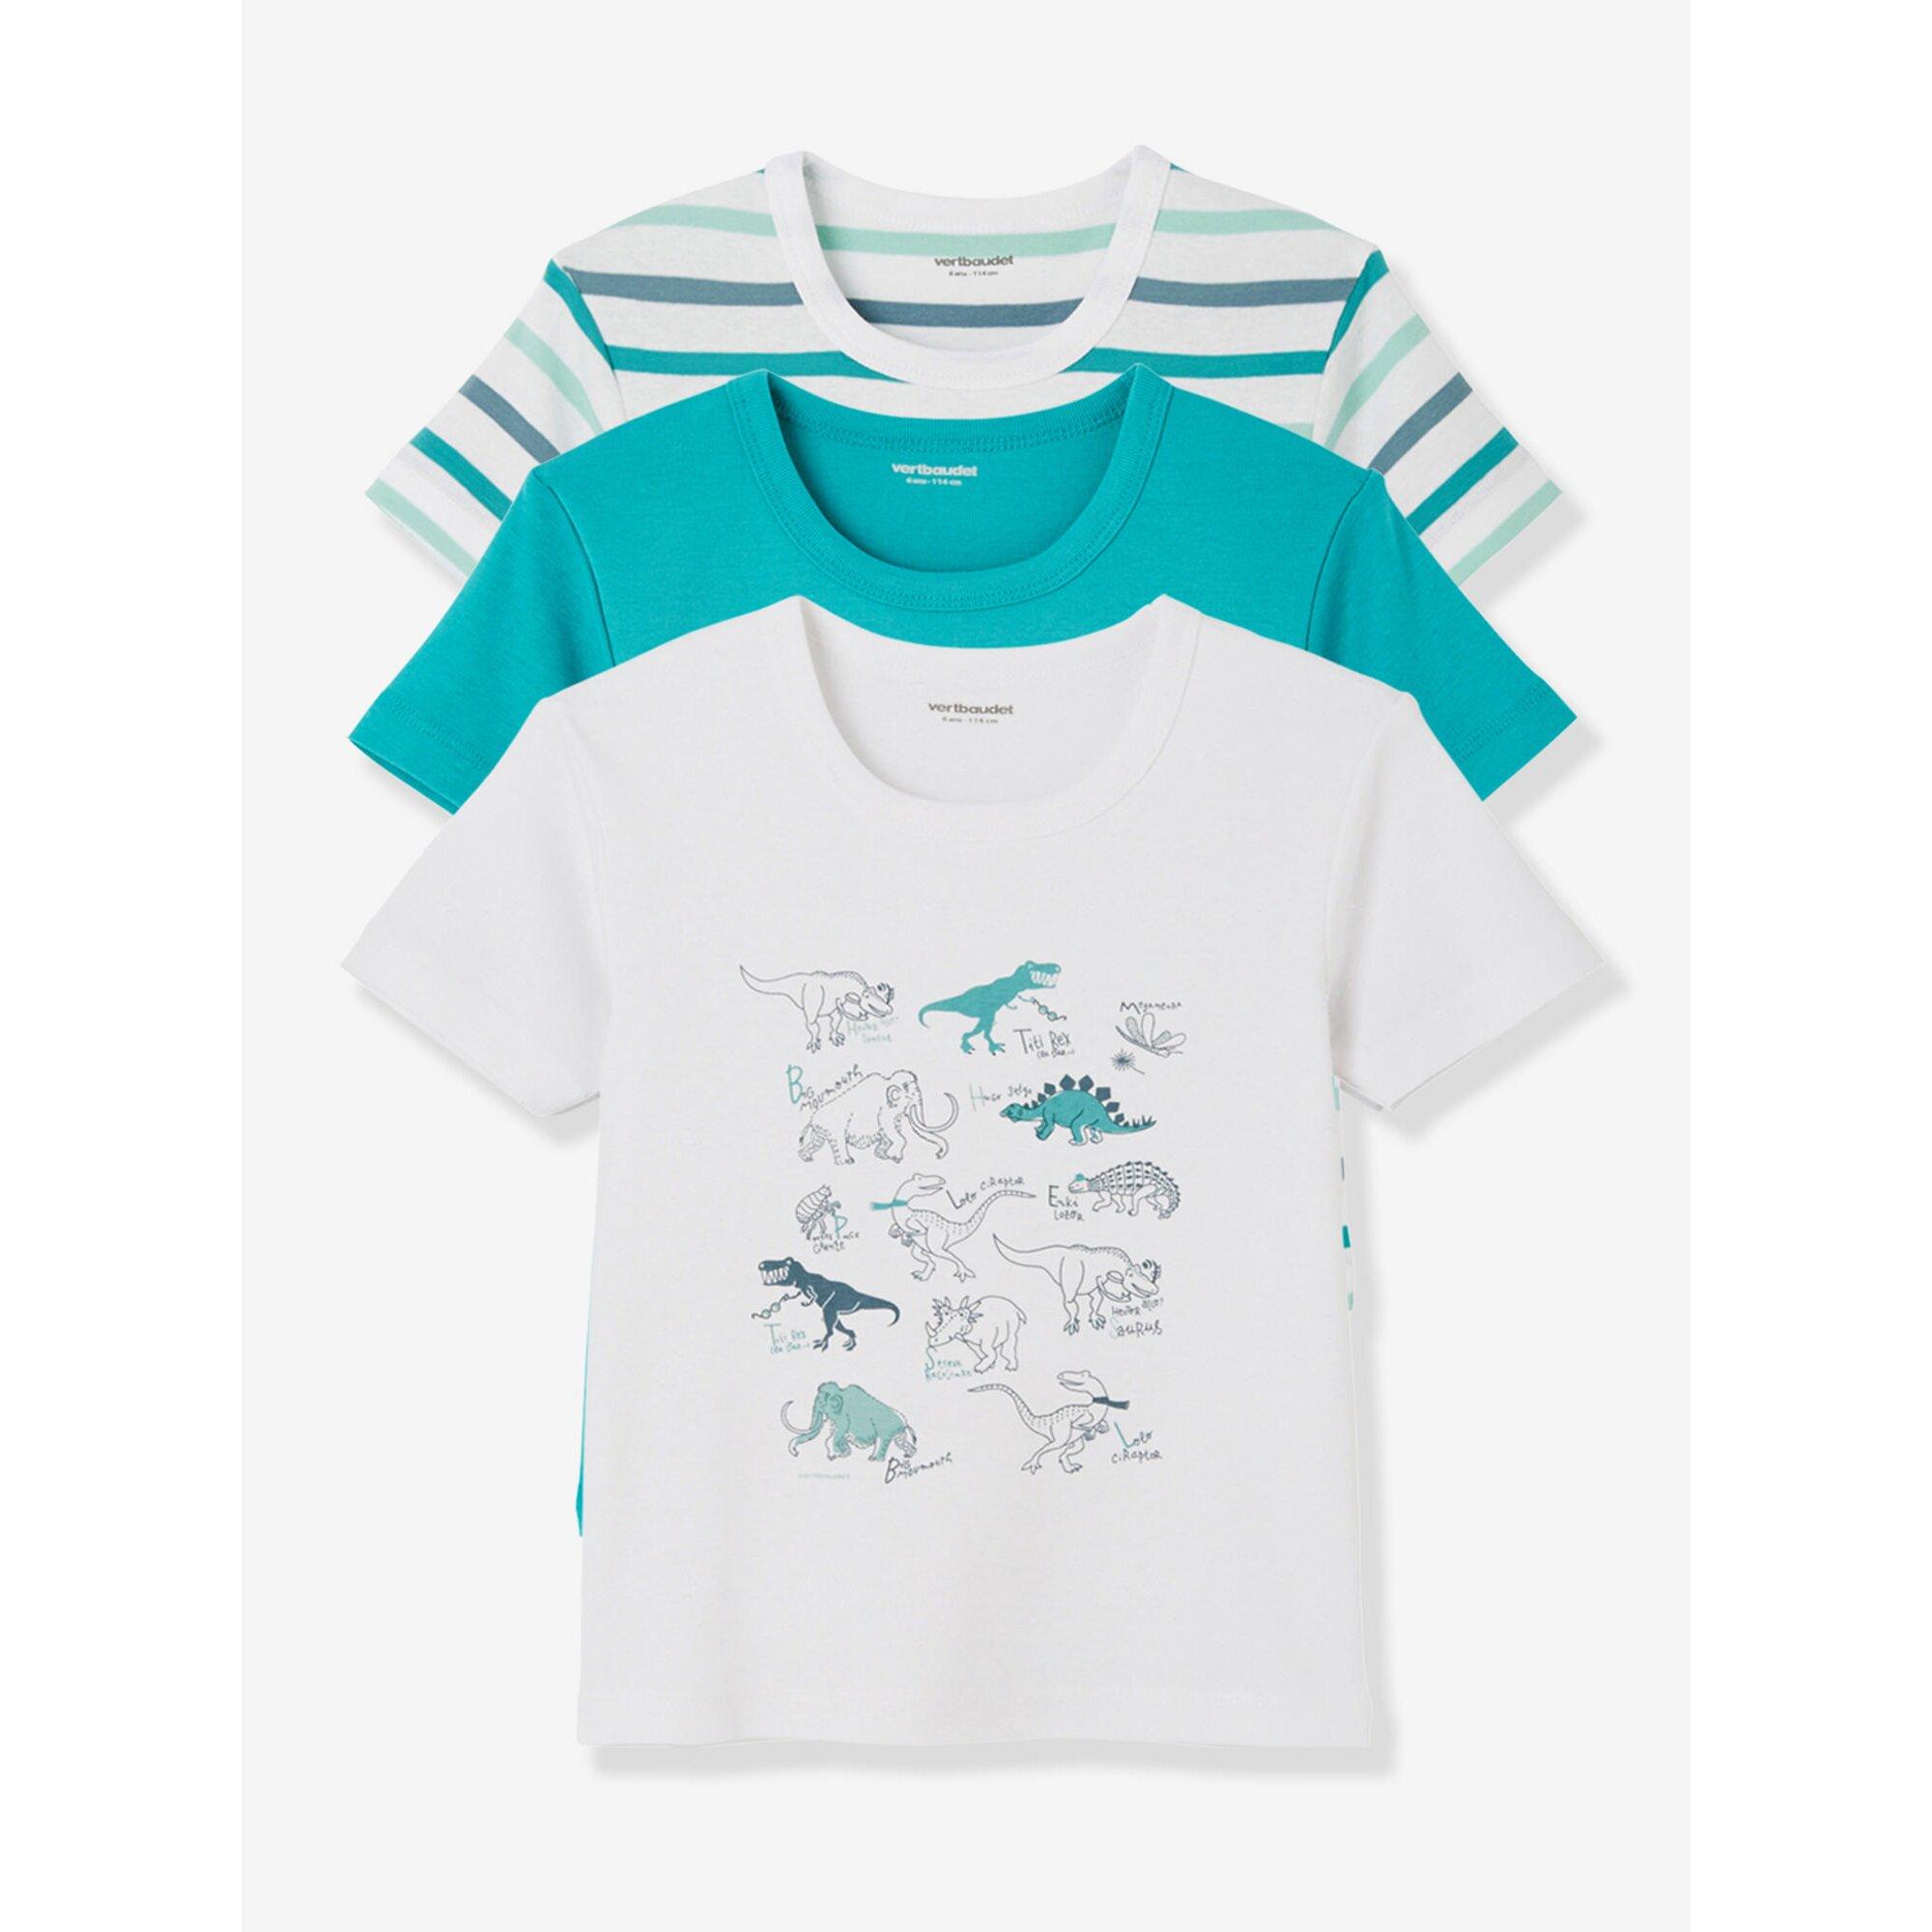 vertbaudet-3er-pack-jungen-t-shirts